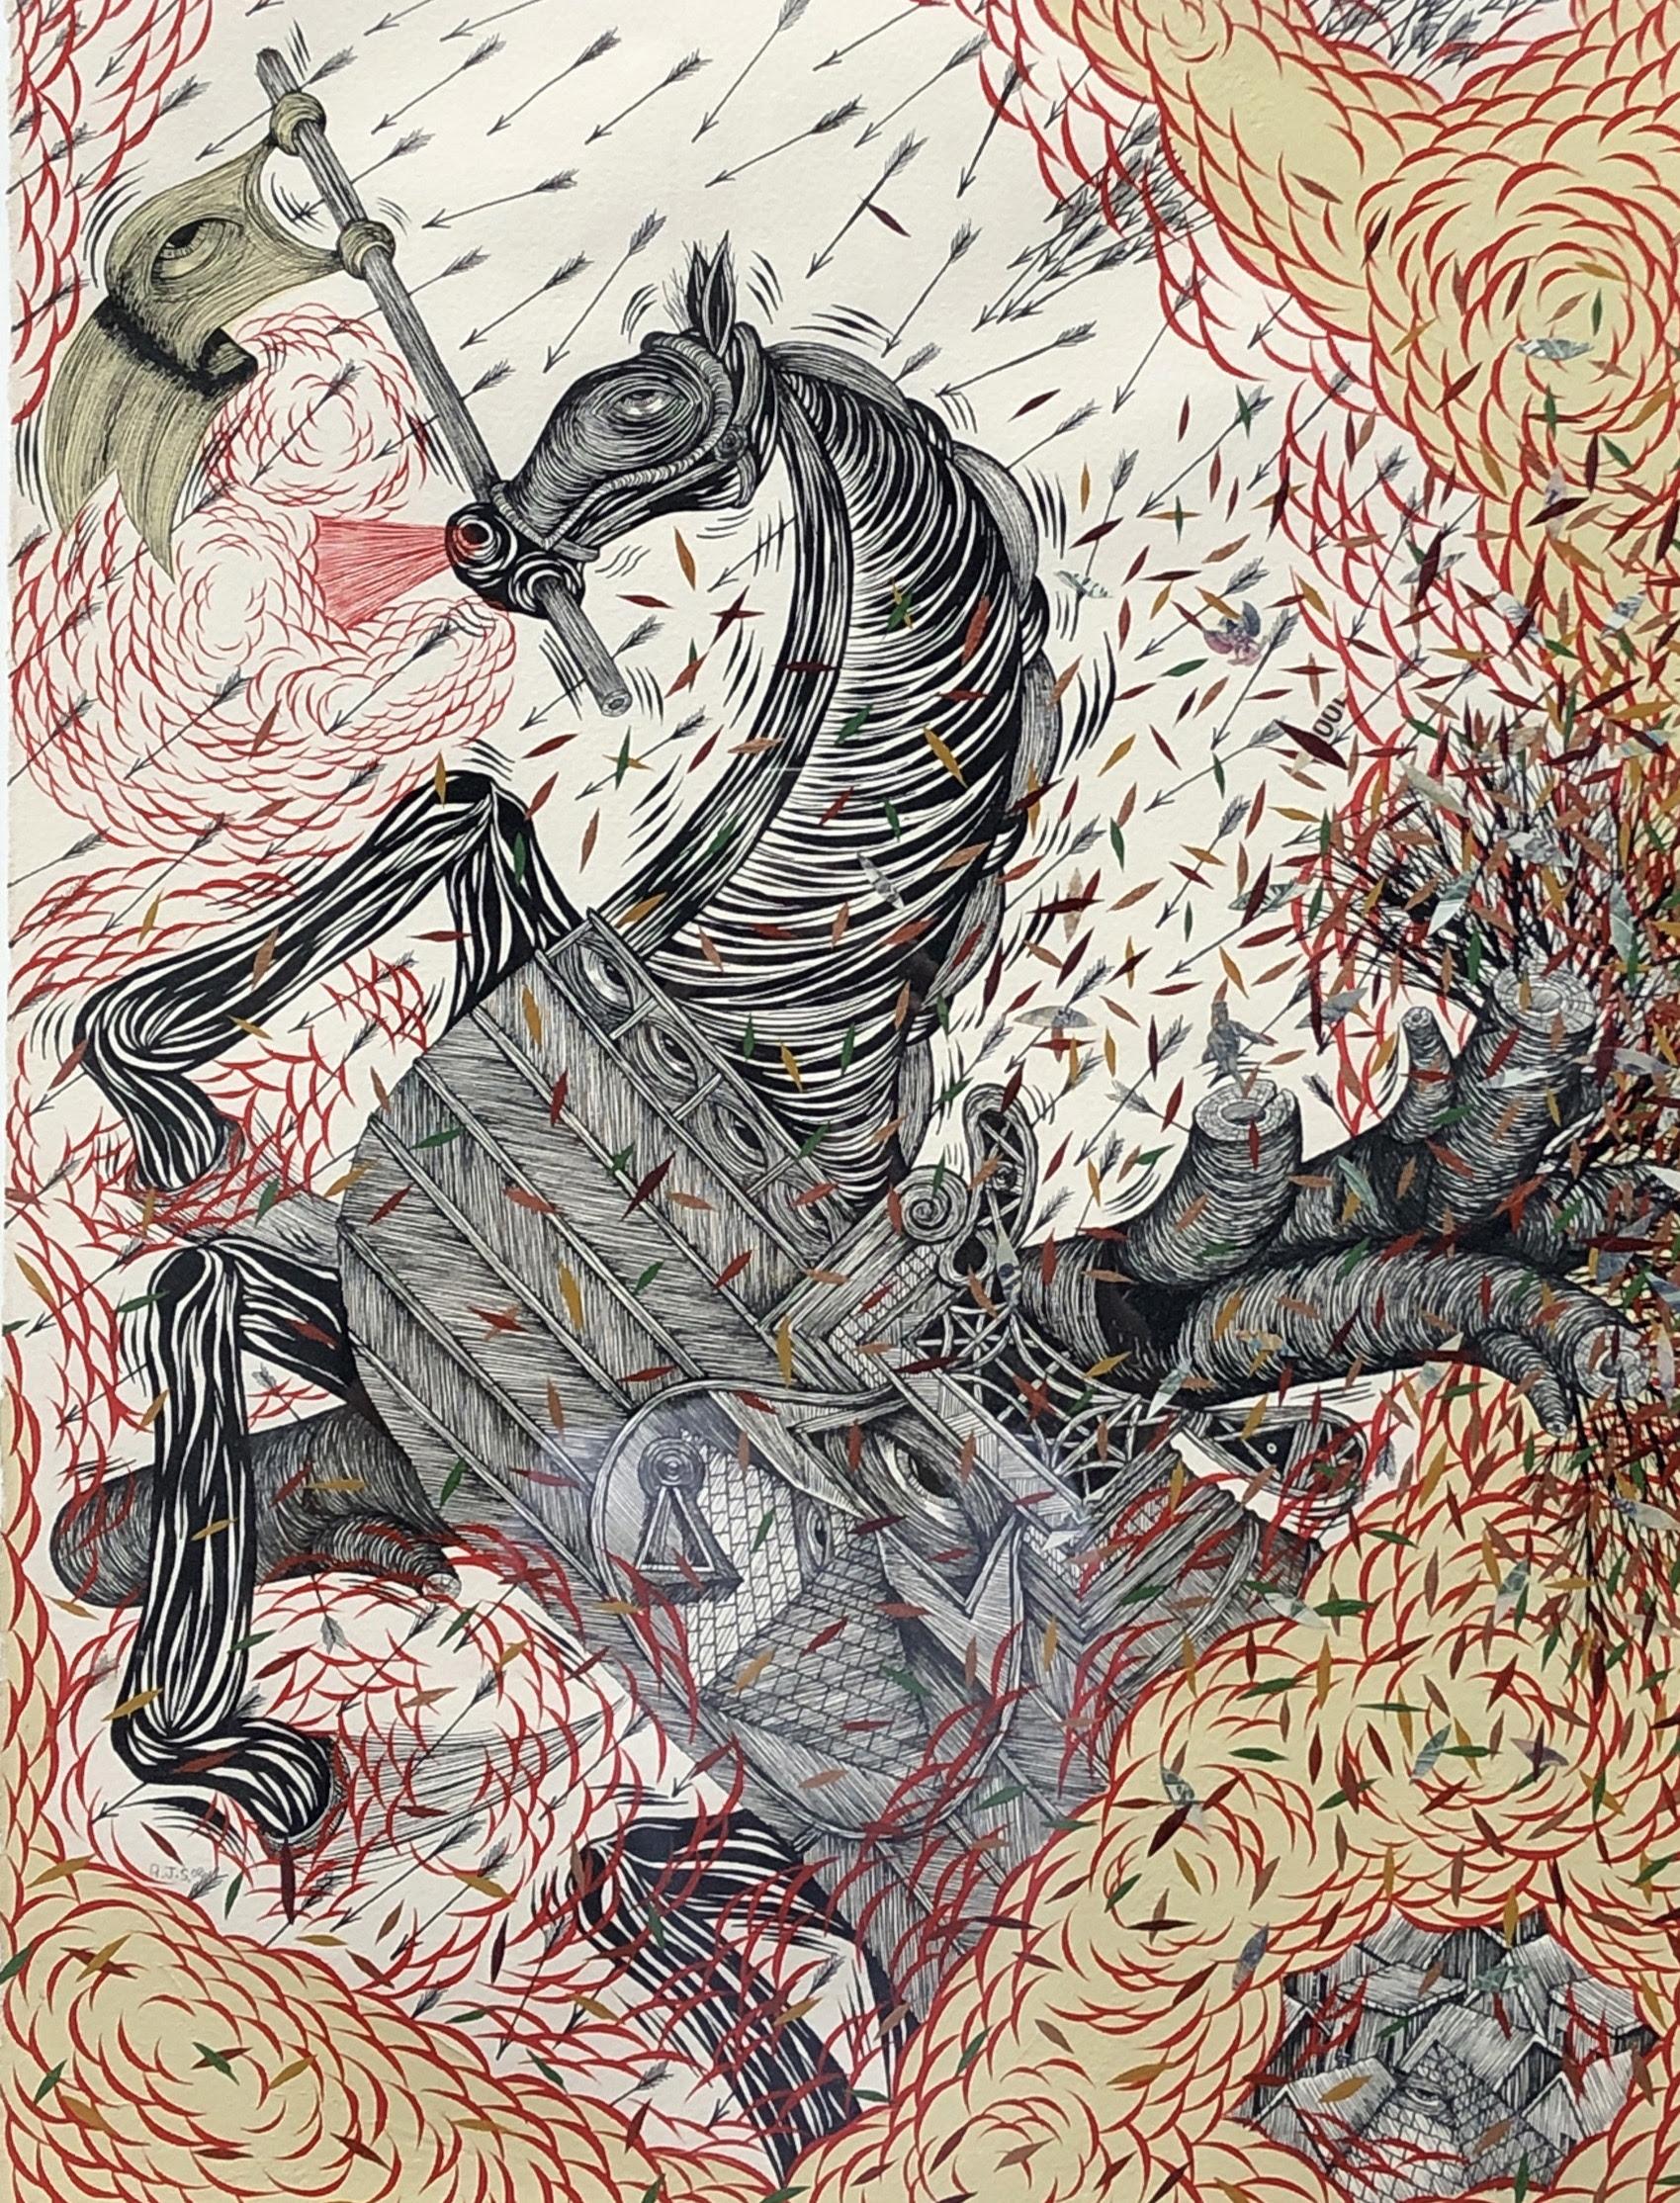 Andrew Schoultz Horse Under Fire, 2006